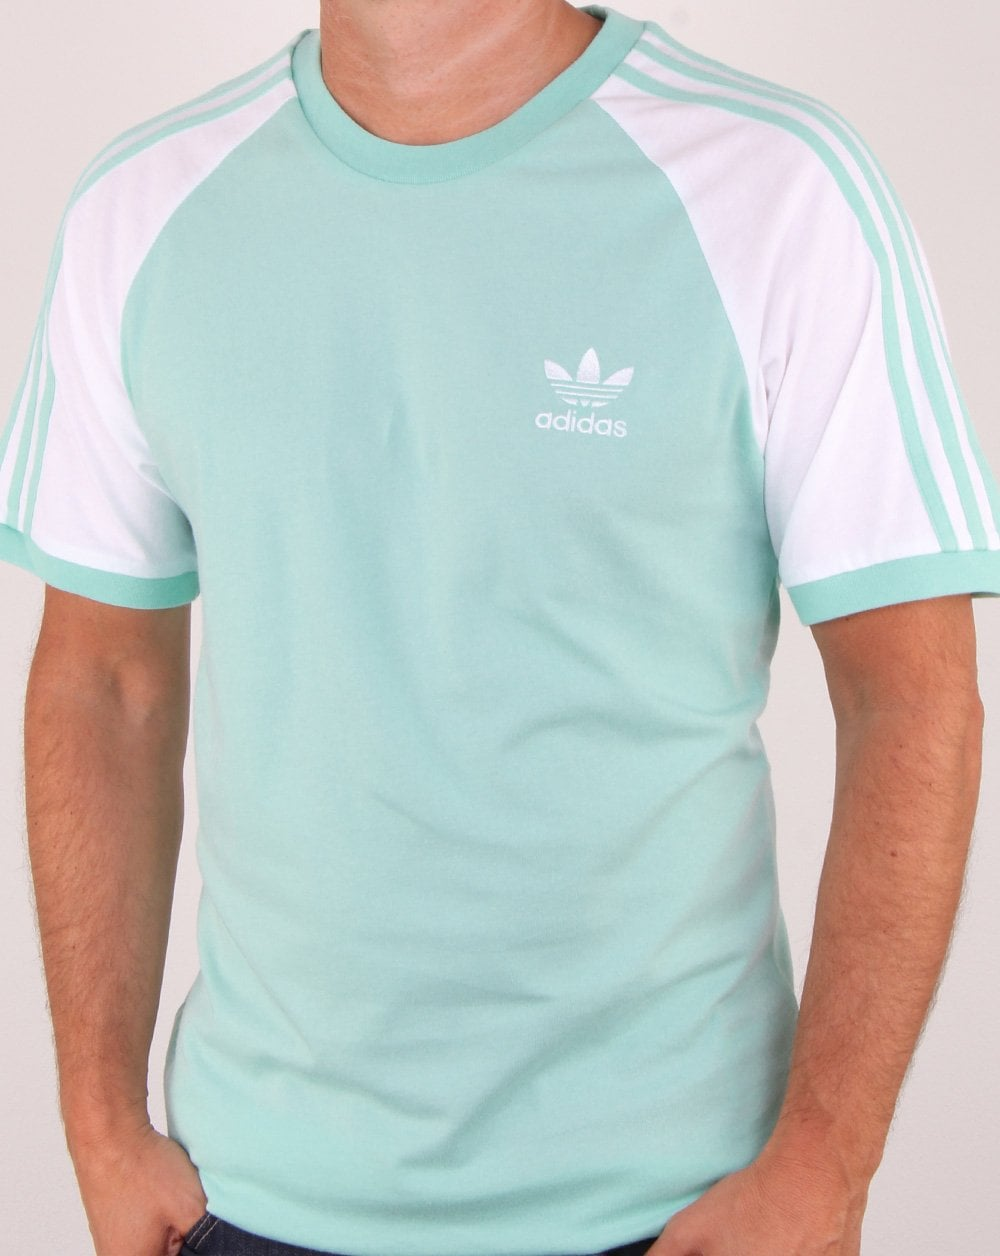 bc387143 Adidas Originals 3 Stripes T Shirt Clear Mint, Mens, Tee, Cotton, Crew